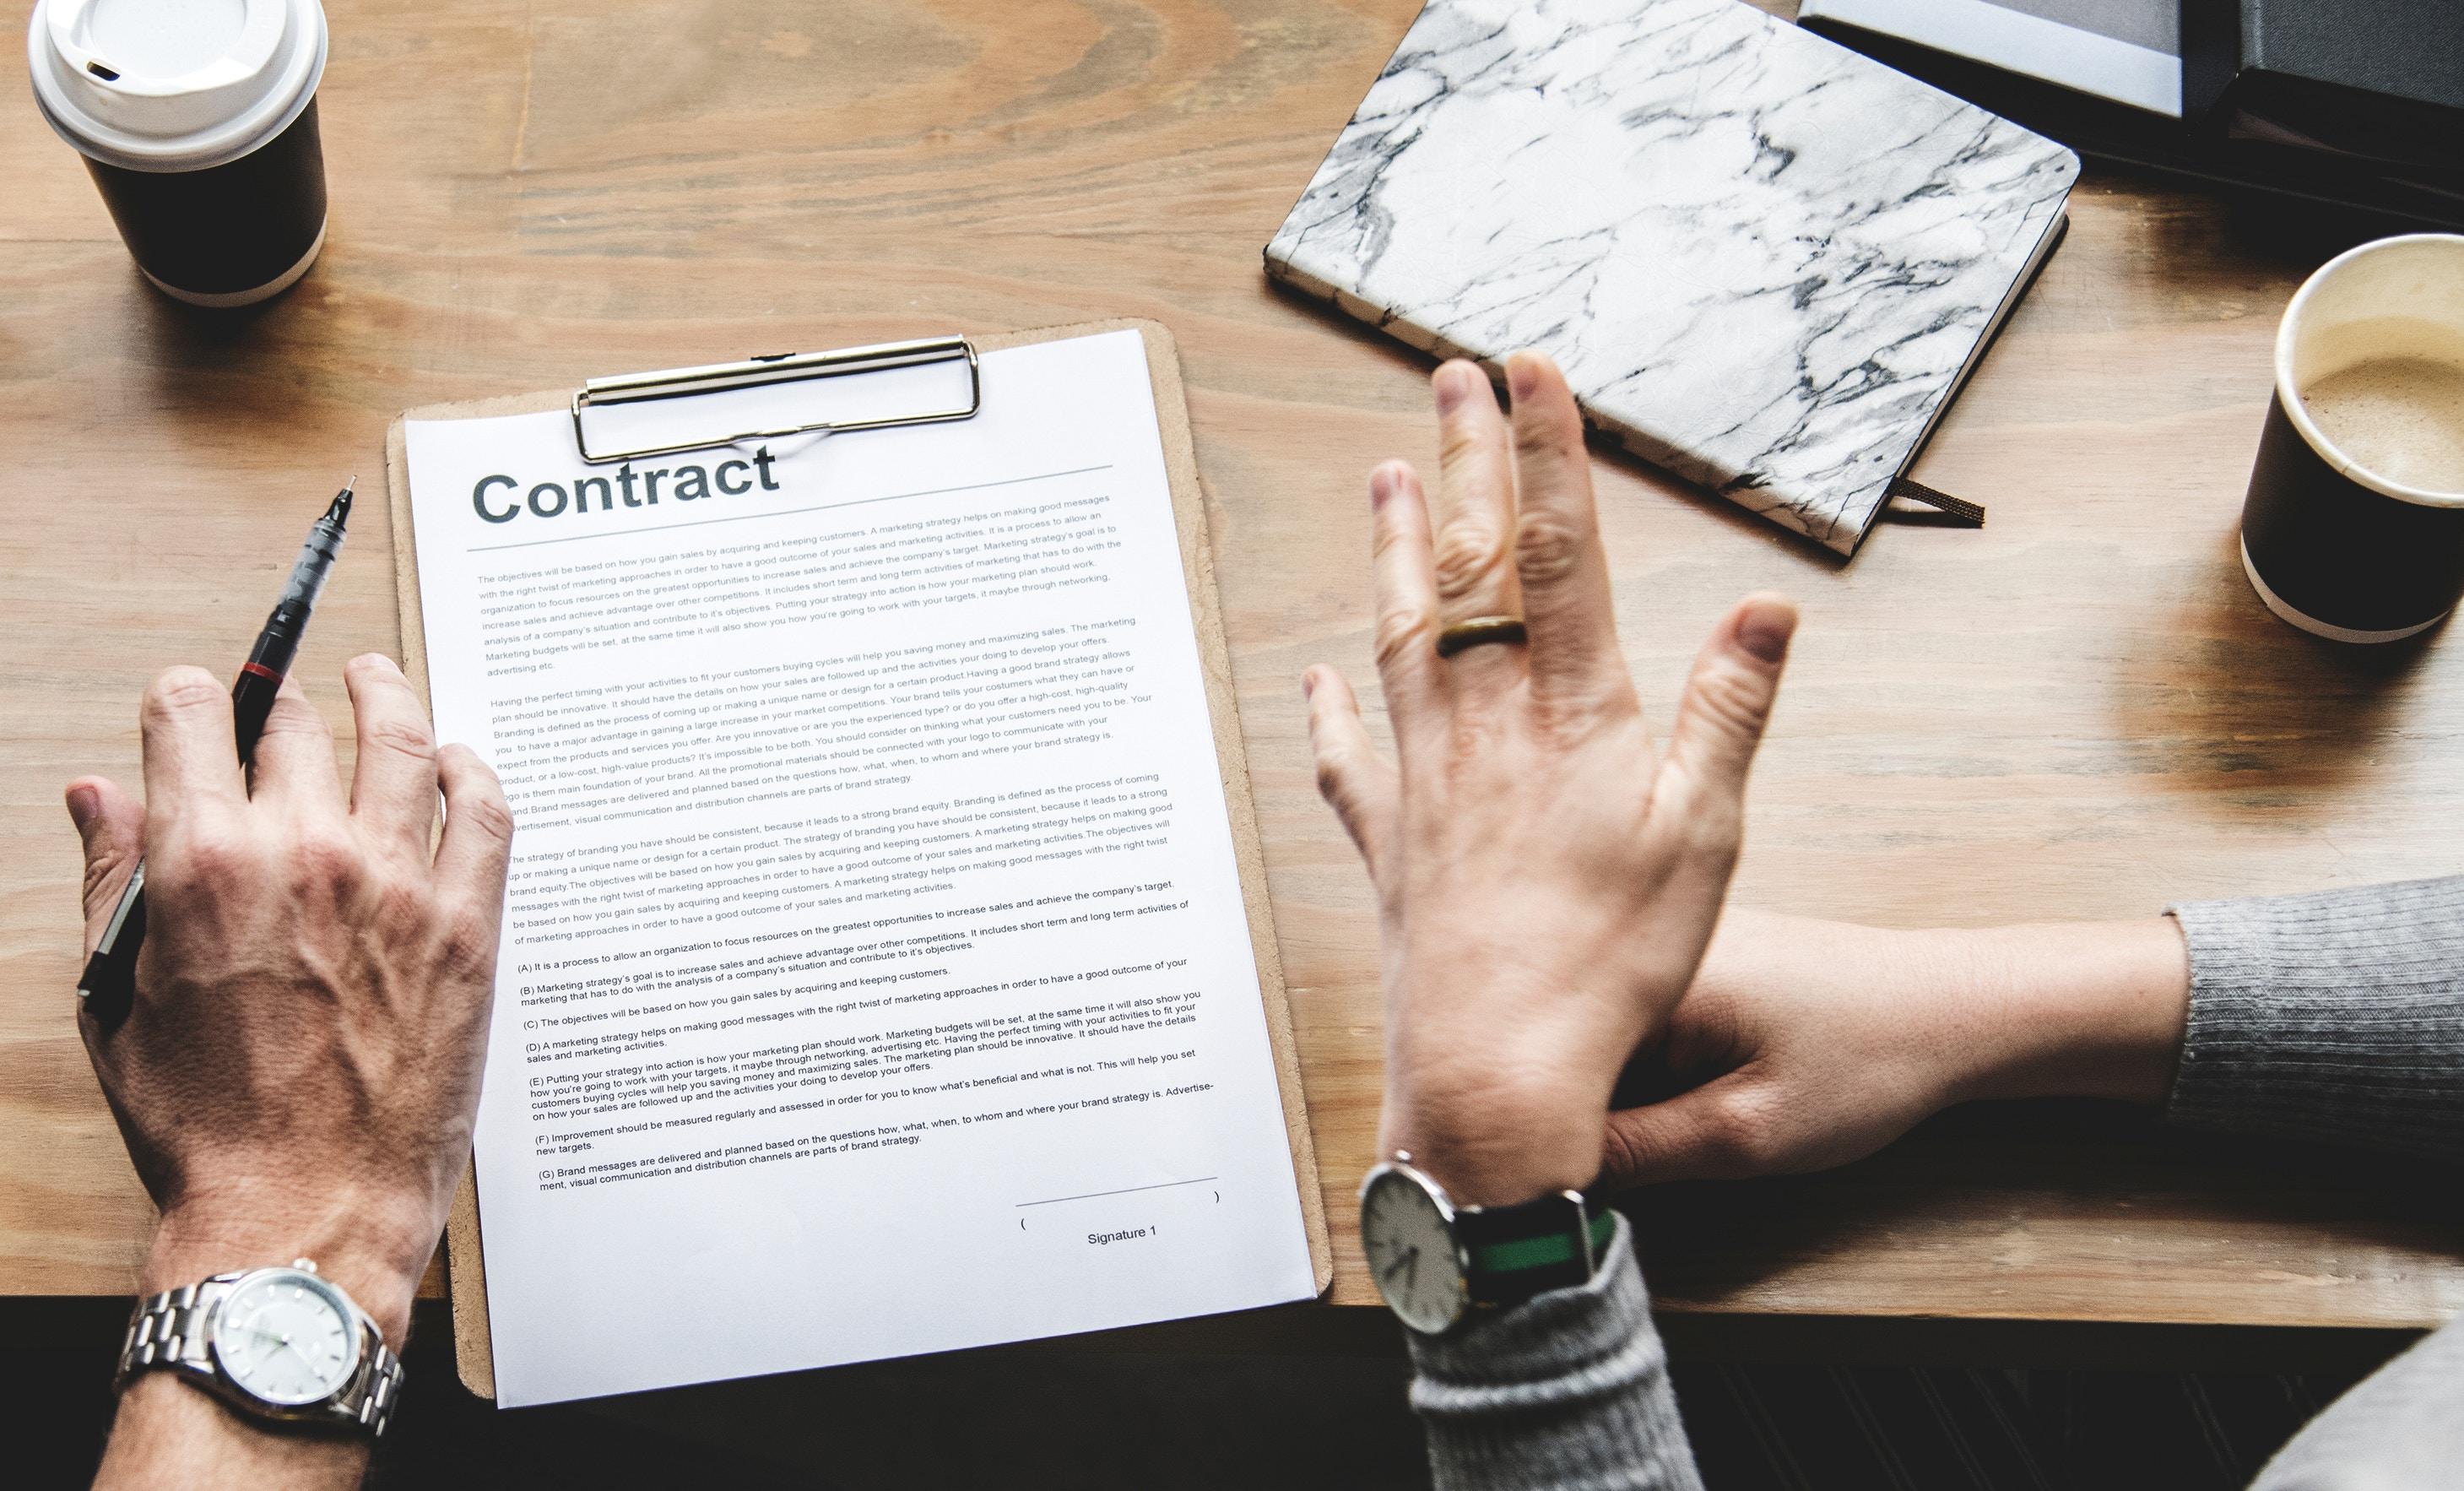 El contrato fijo discontinuo Finutive